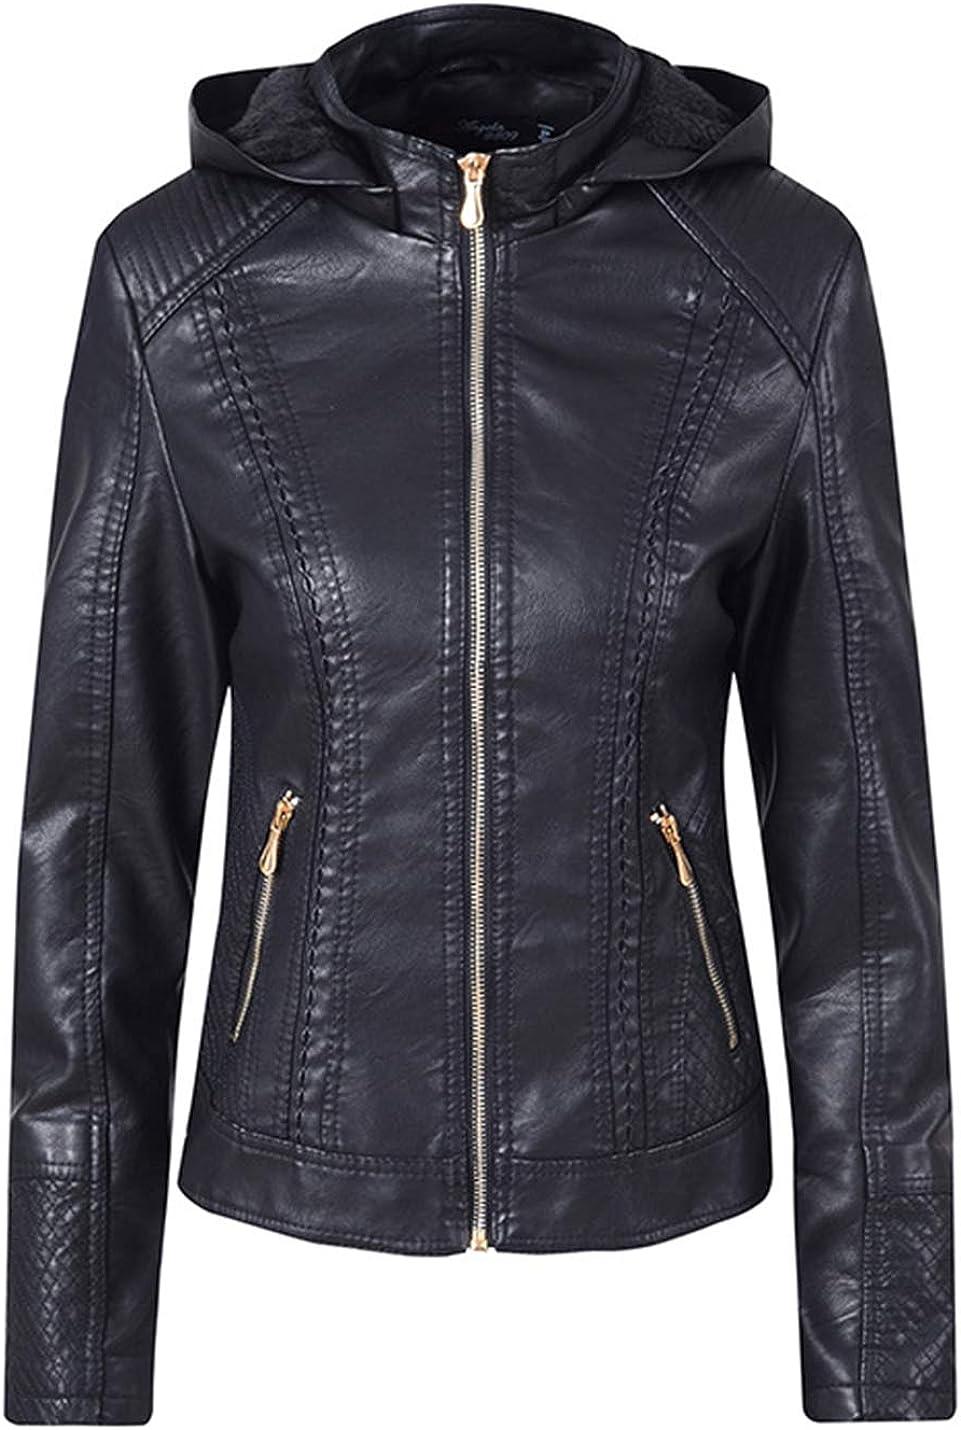 PAODIKUAI Women's Basic Fleece Lined Warm Zip Up Detachable Hood Faux Pu Leather Moto Biker Jacket